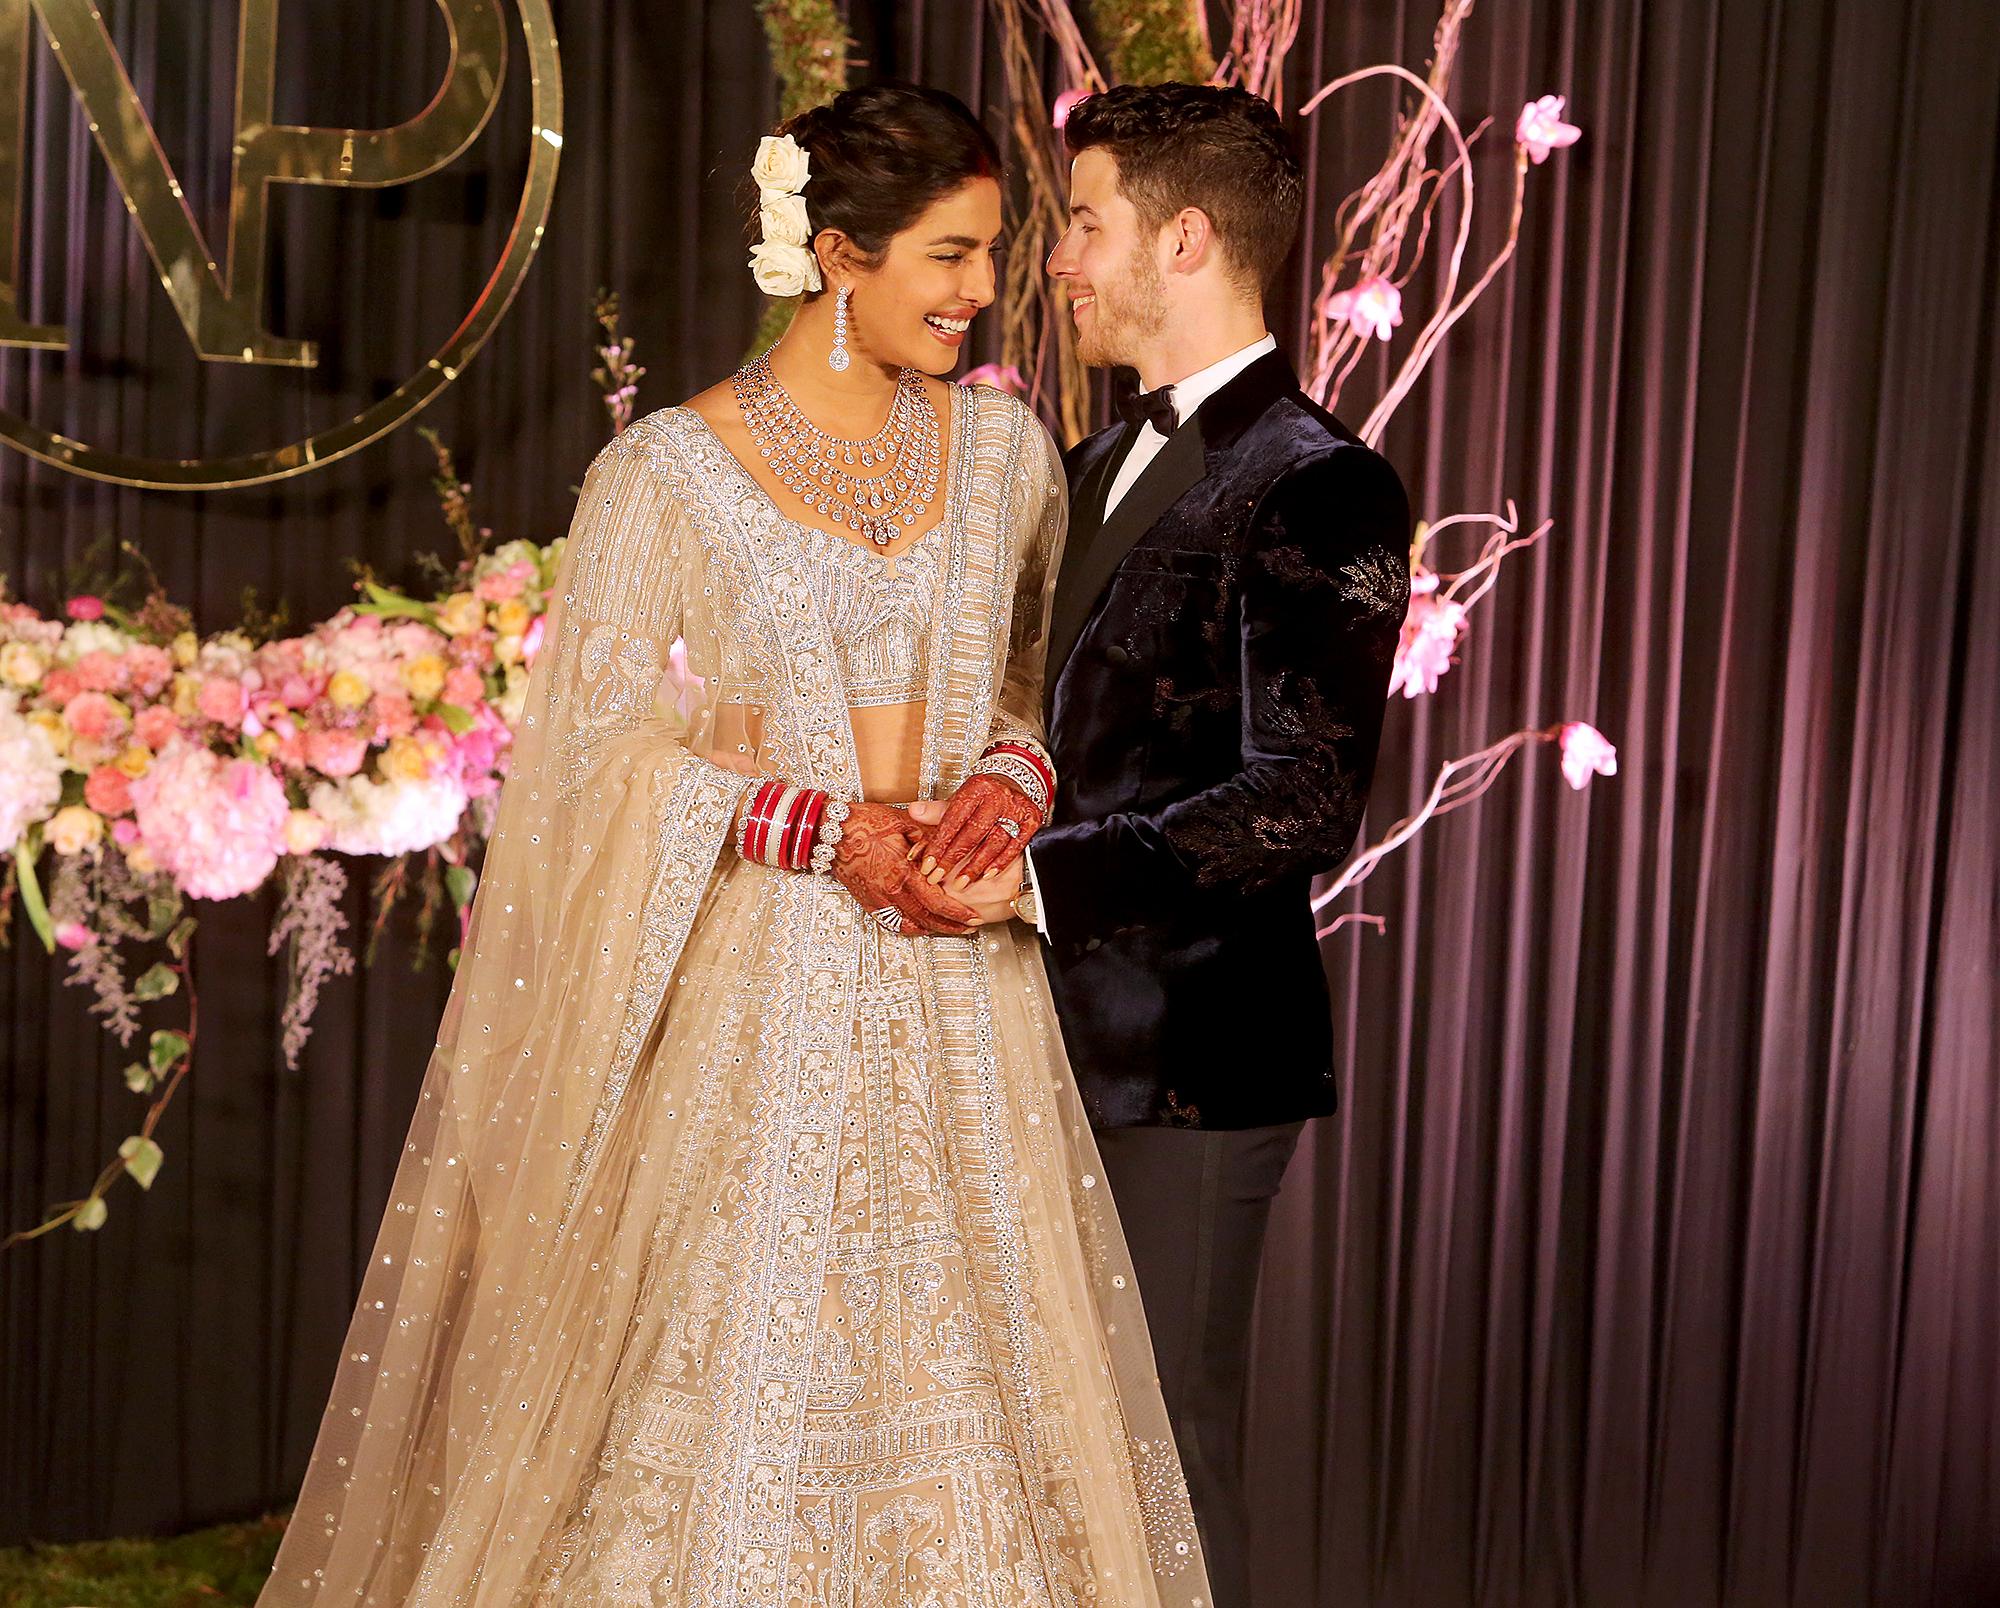 Karamo-Brown-Wants-to-'Recreate'-Nick-Jonas-and-Priyanka-Chopra's-Wedding-2